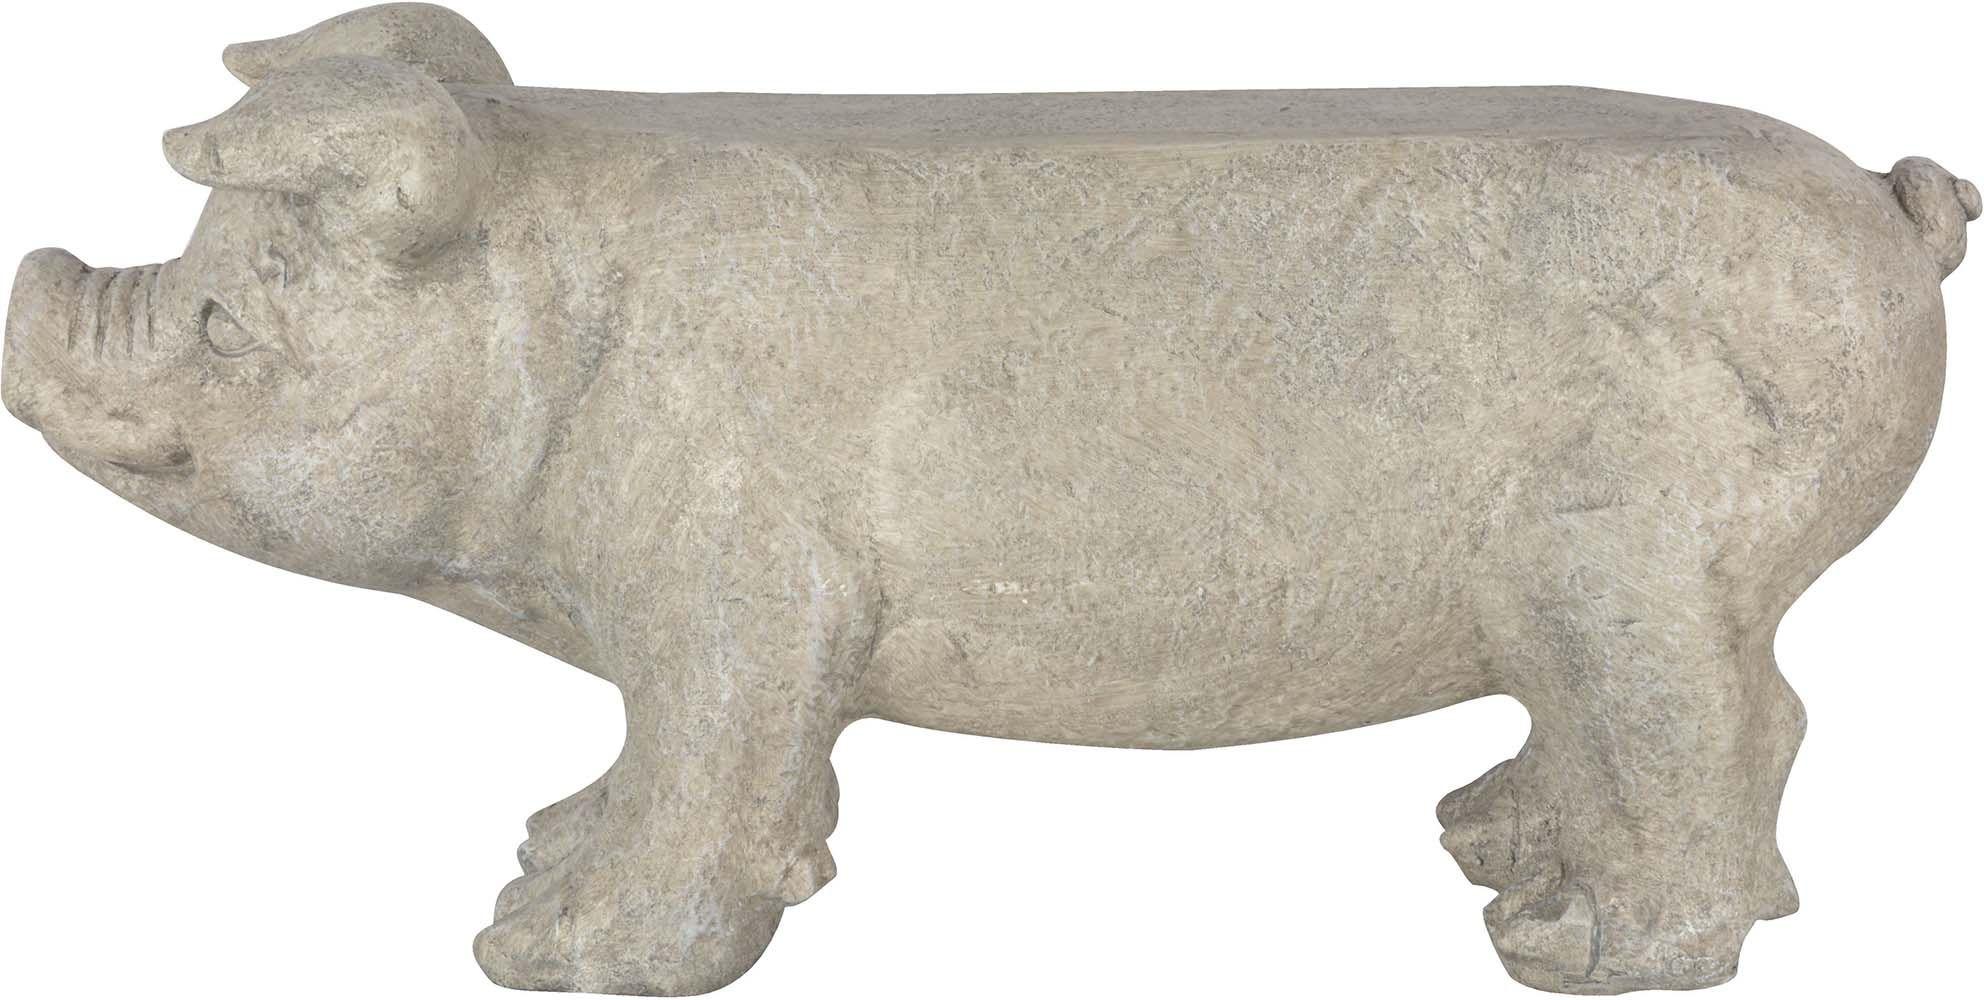 Banc de jardin cochon en pierre for Banc de jardin en pierre